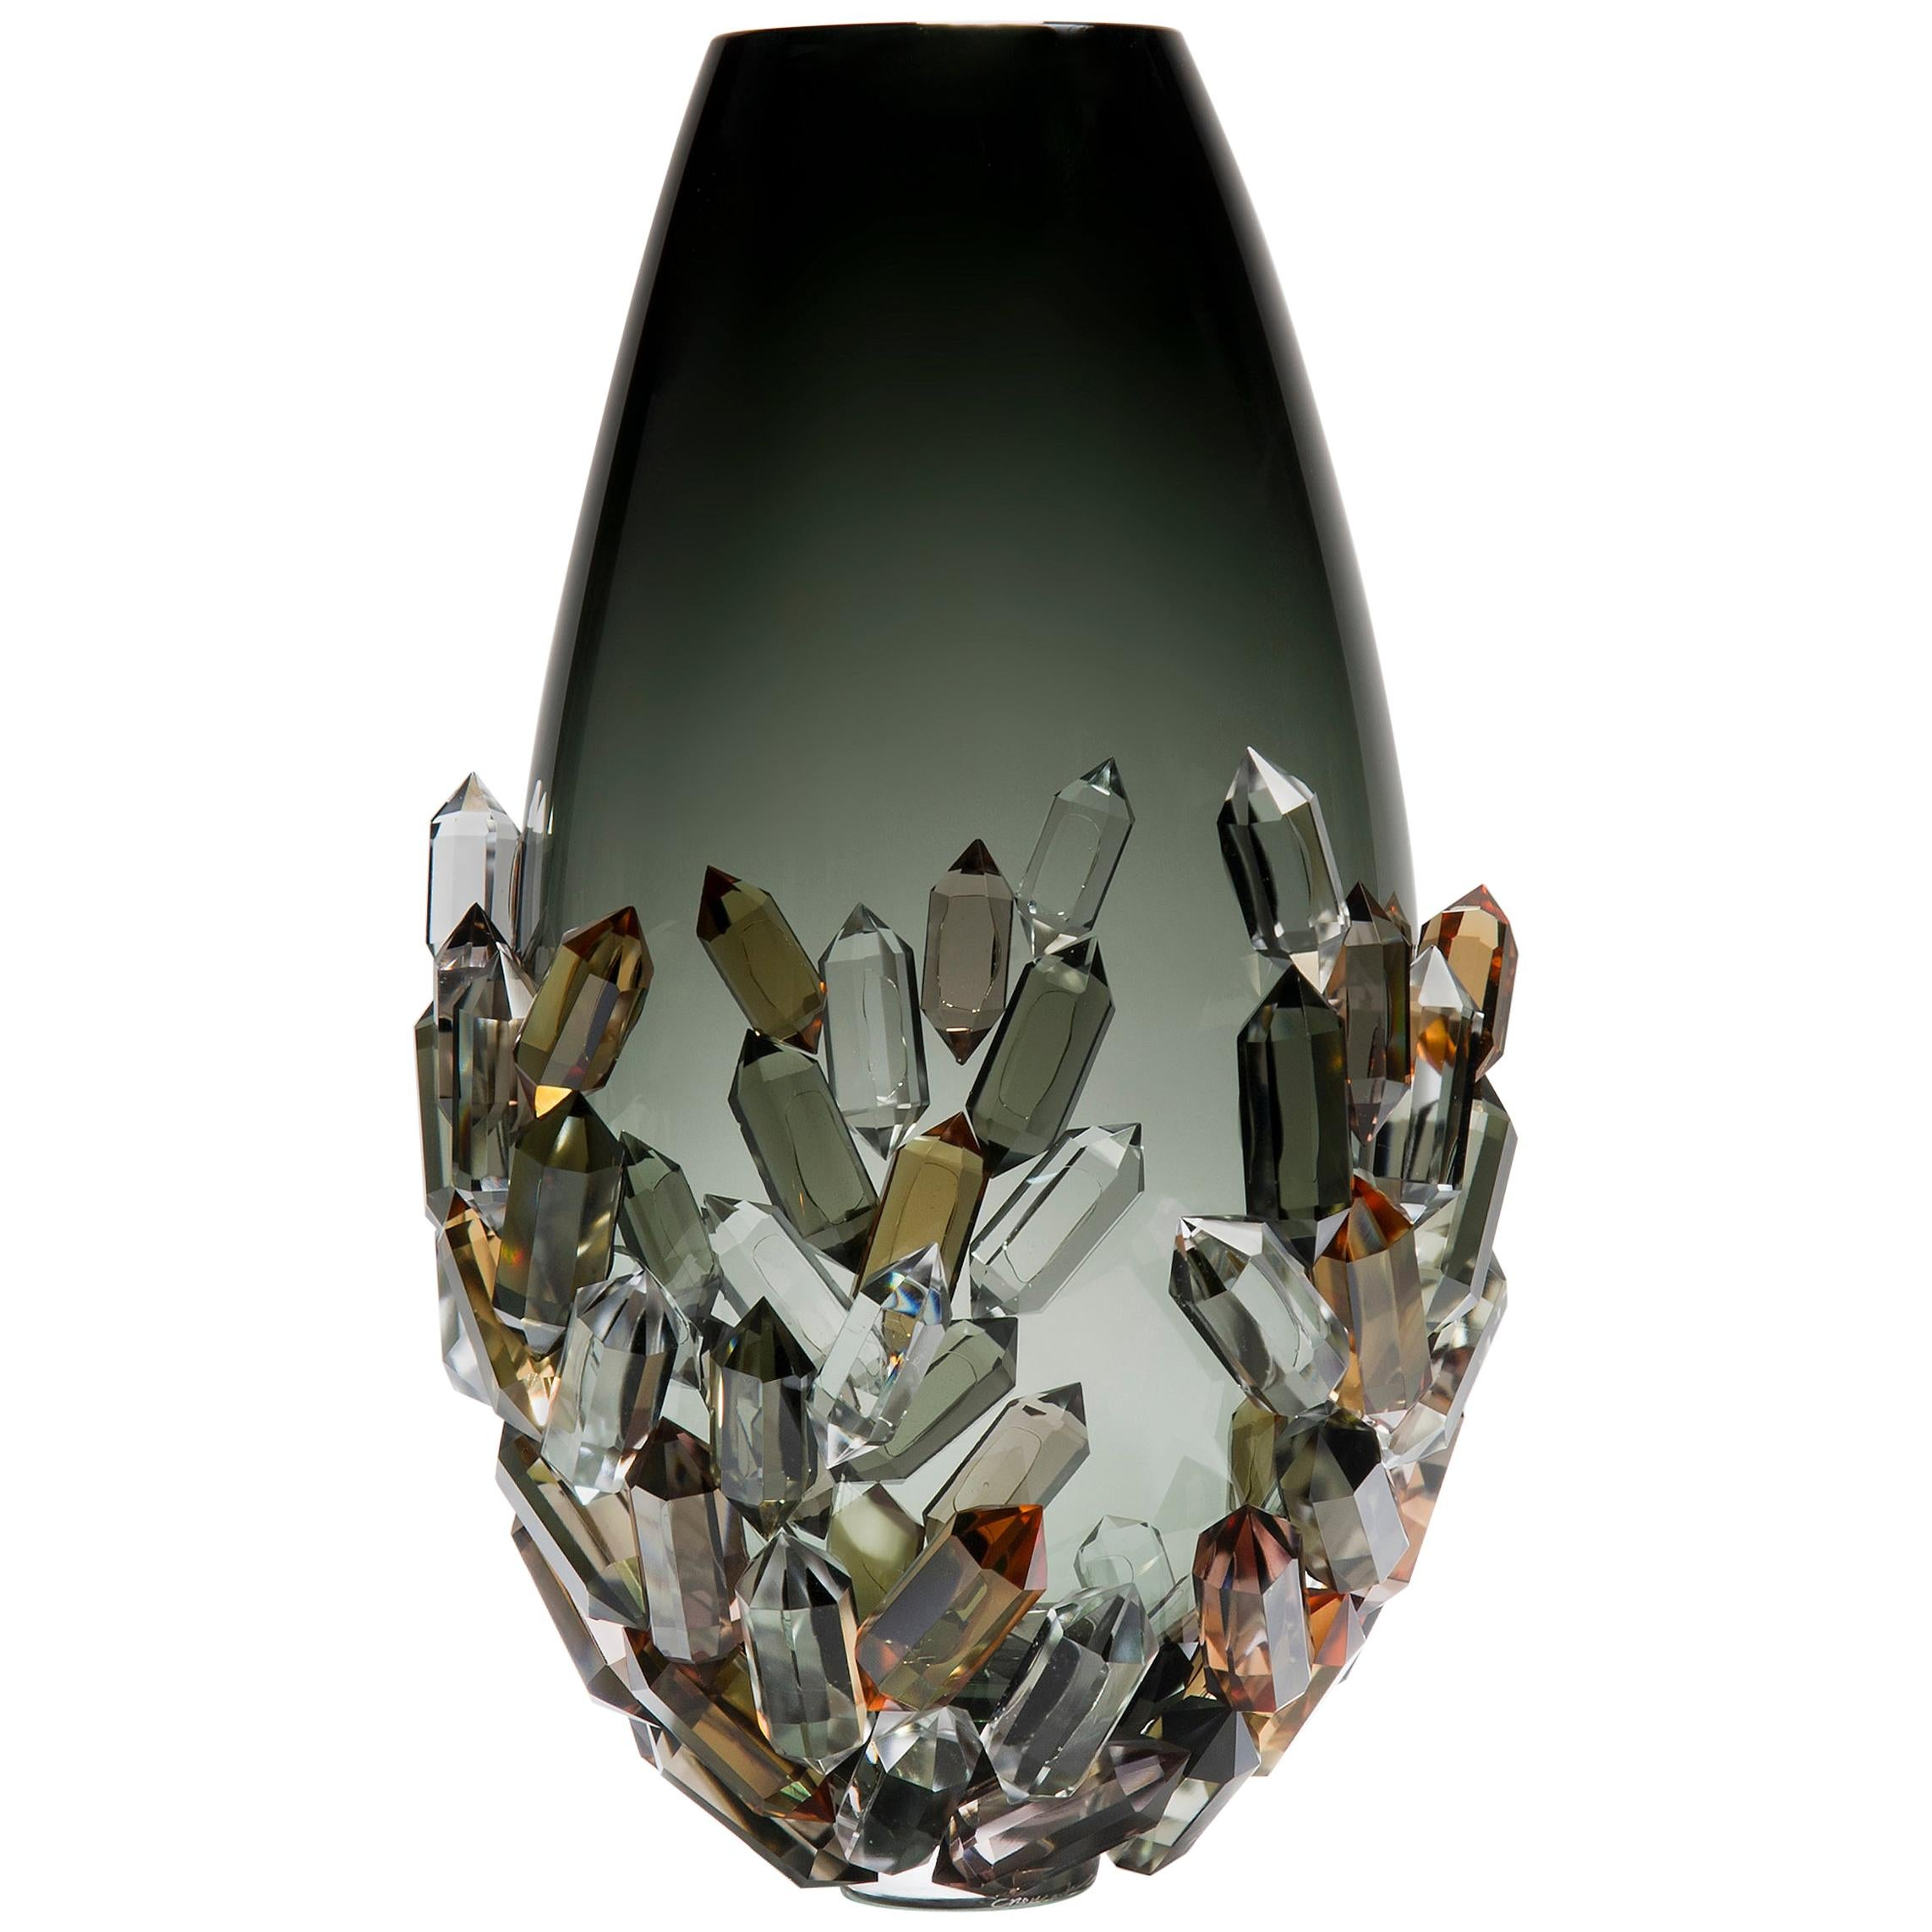 Cristallized Golden, a unique bronze, amber & grey glass vase by Hanne Enemark